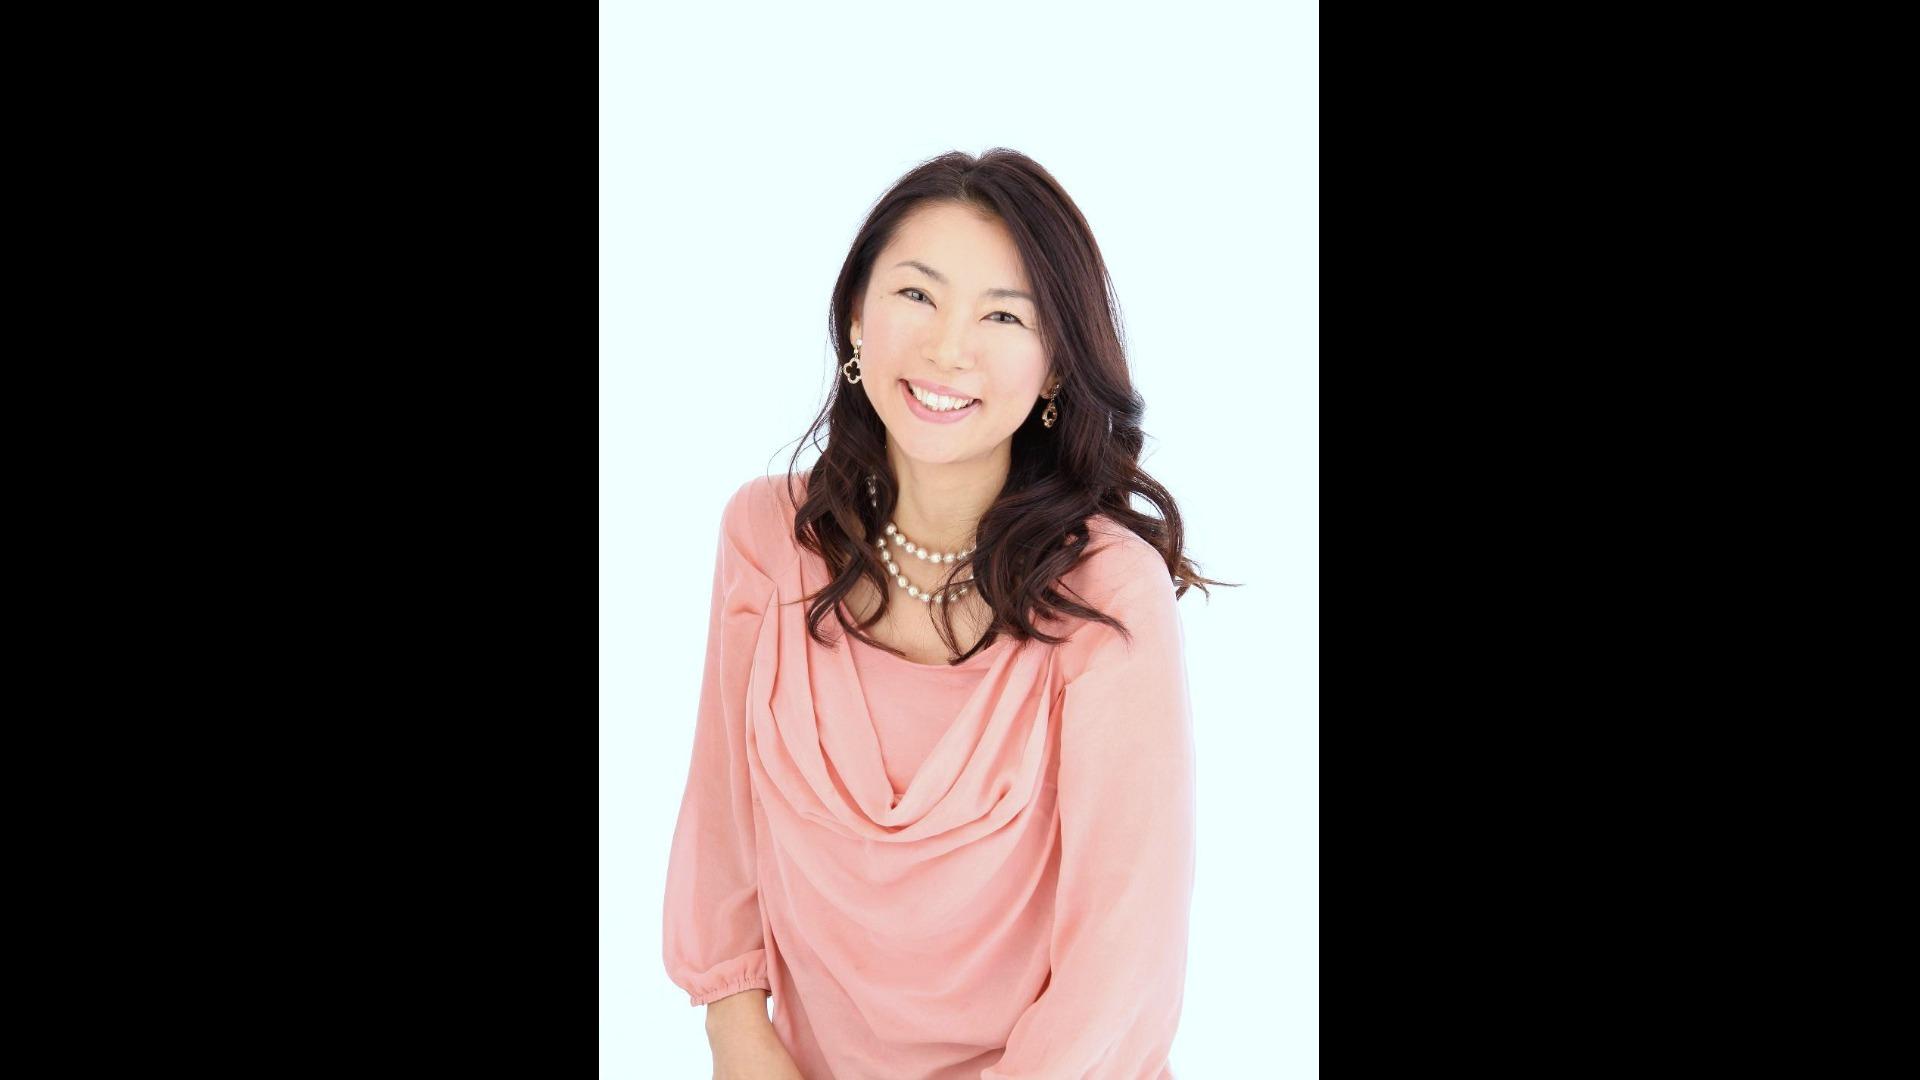 吉田美奈子 Minako Yoshida